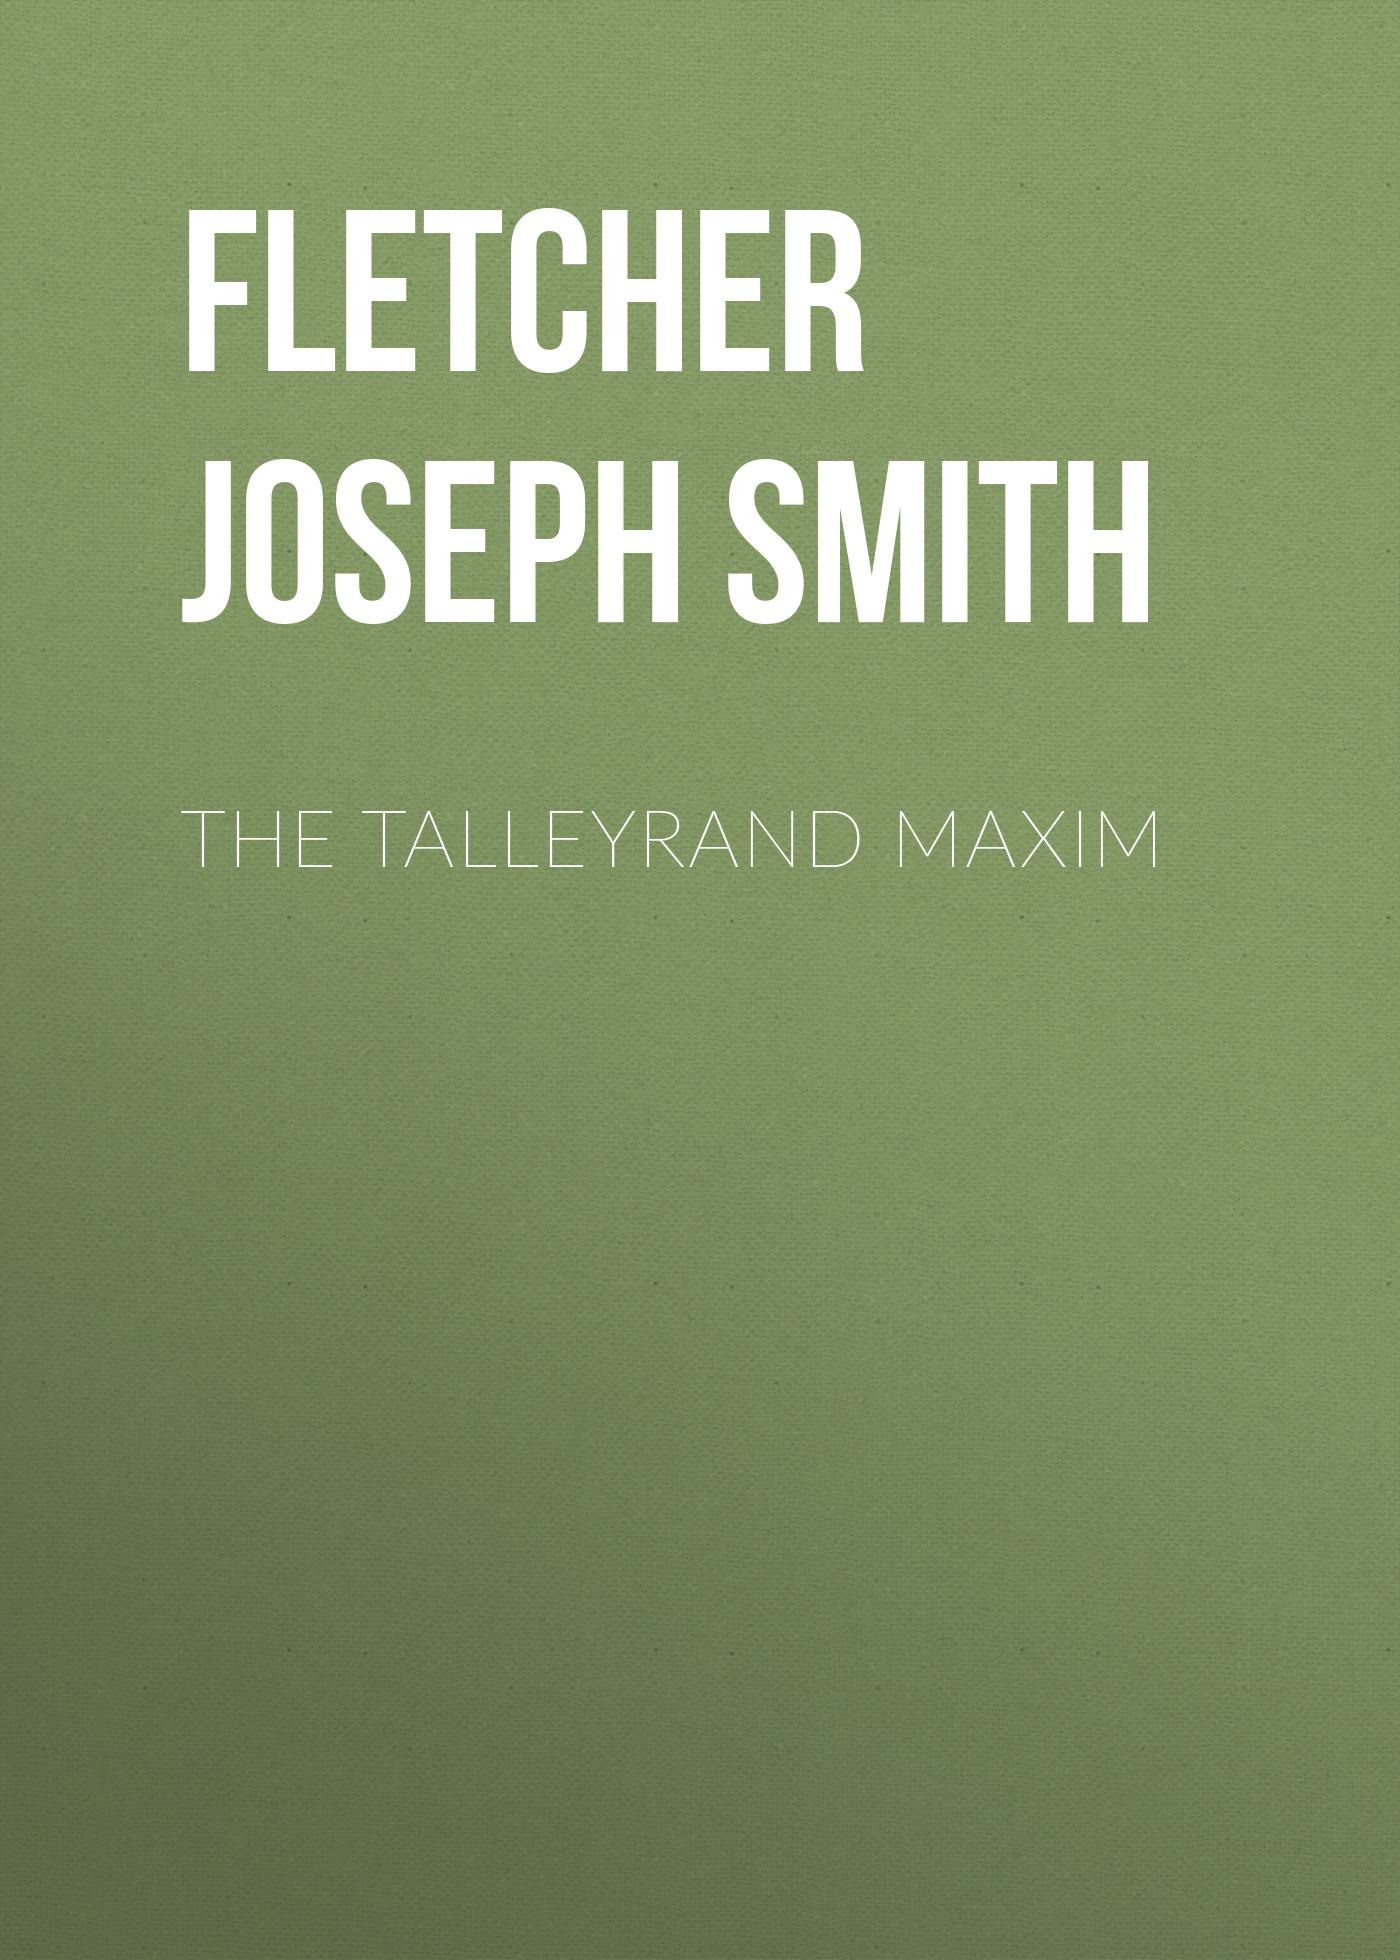 Fletcher Joseph Smith The Talleyrand Maxim